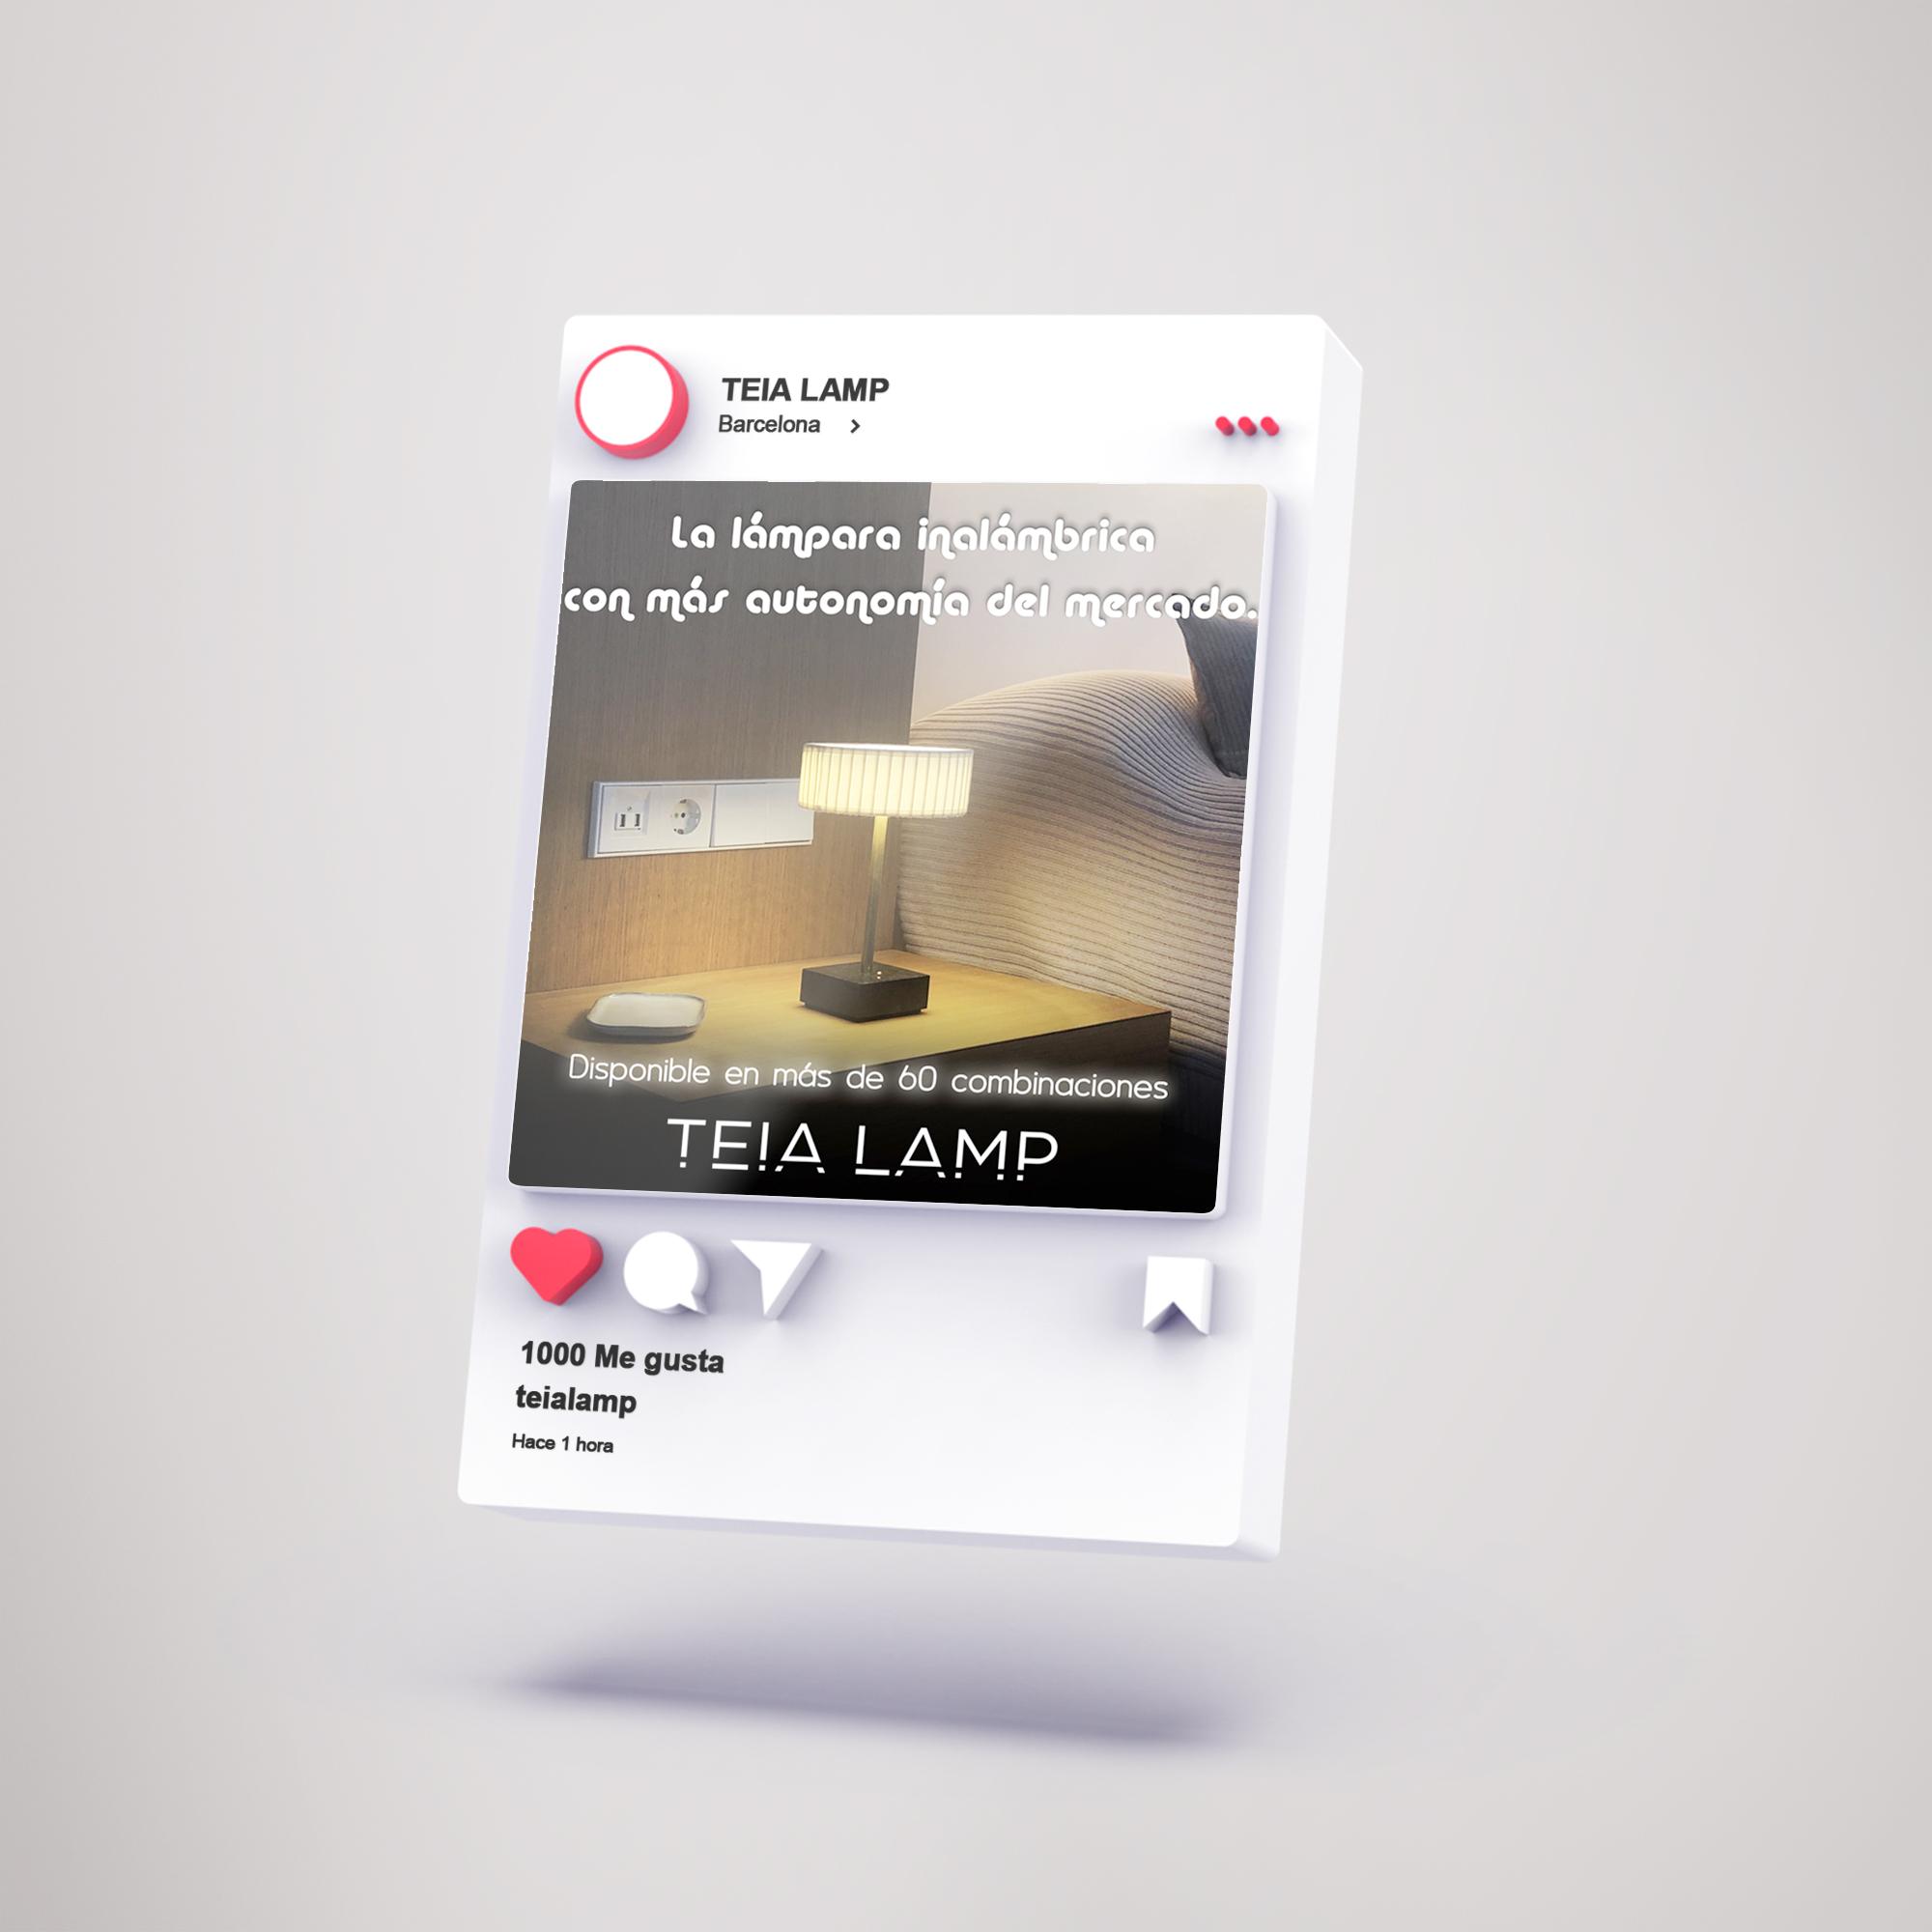 TEIA LAMP   Campaña Facebook Ads - Estrategia digital